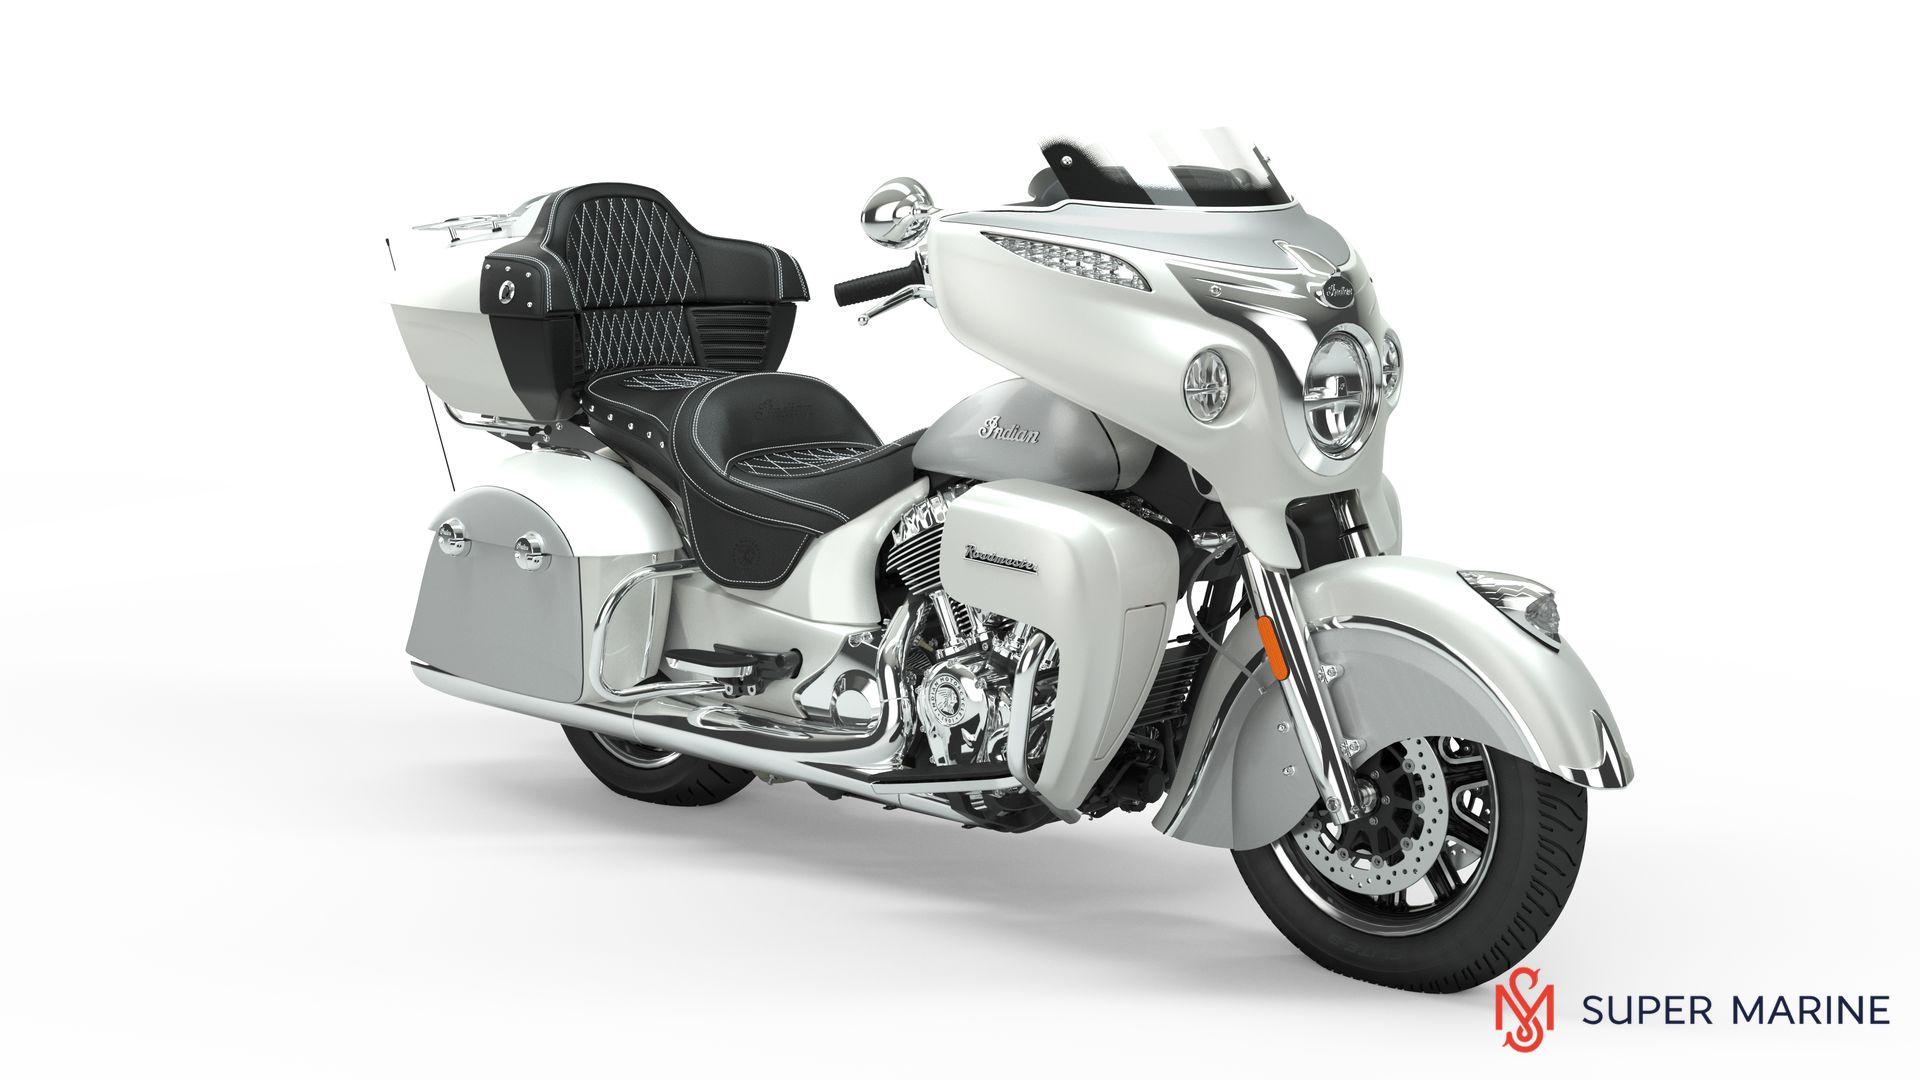 Мотоцикл Indian Roadmaster Pearl White / Star Silver 2019 - 1